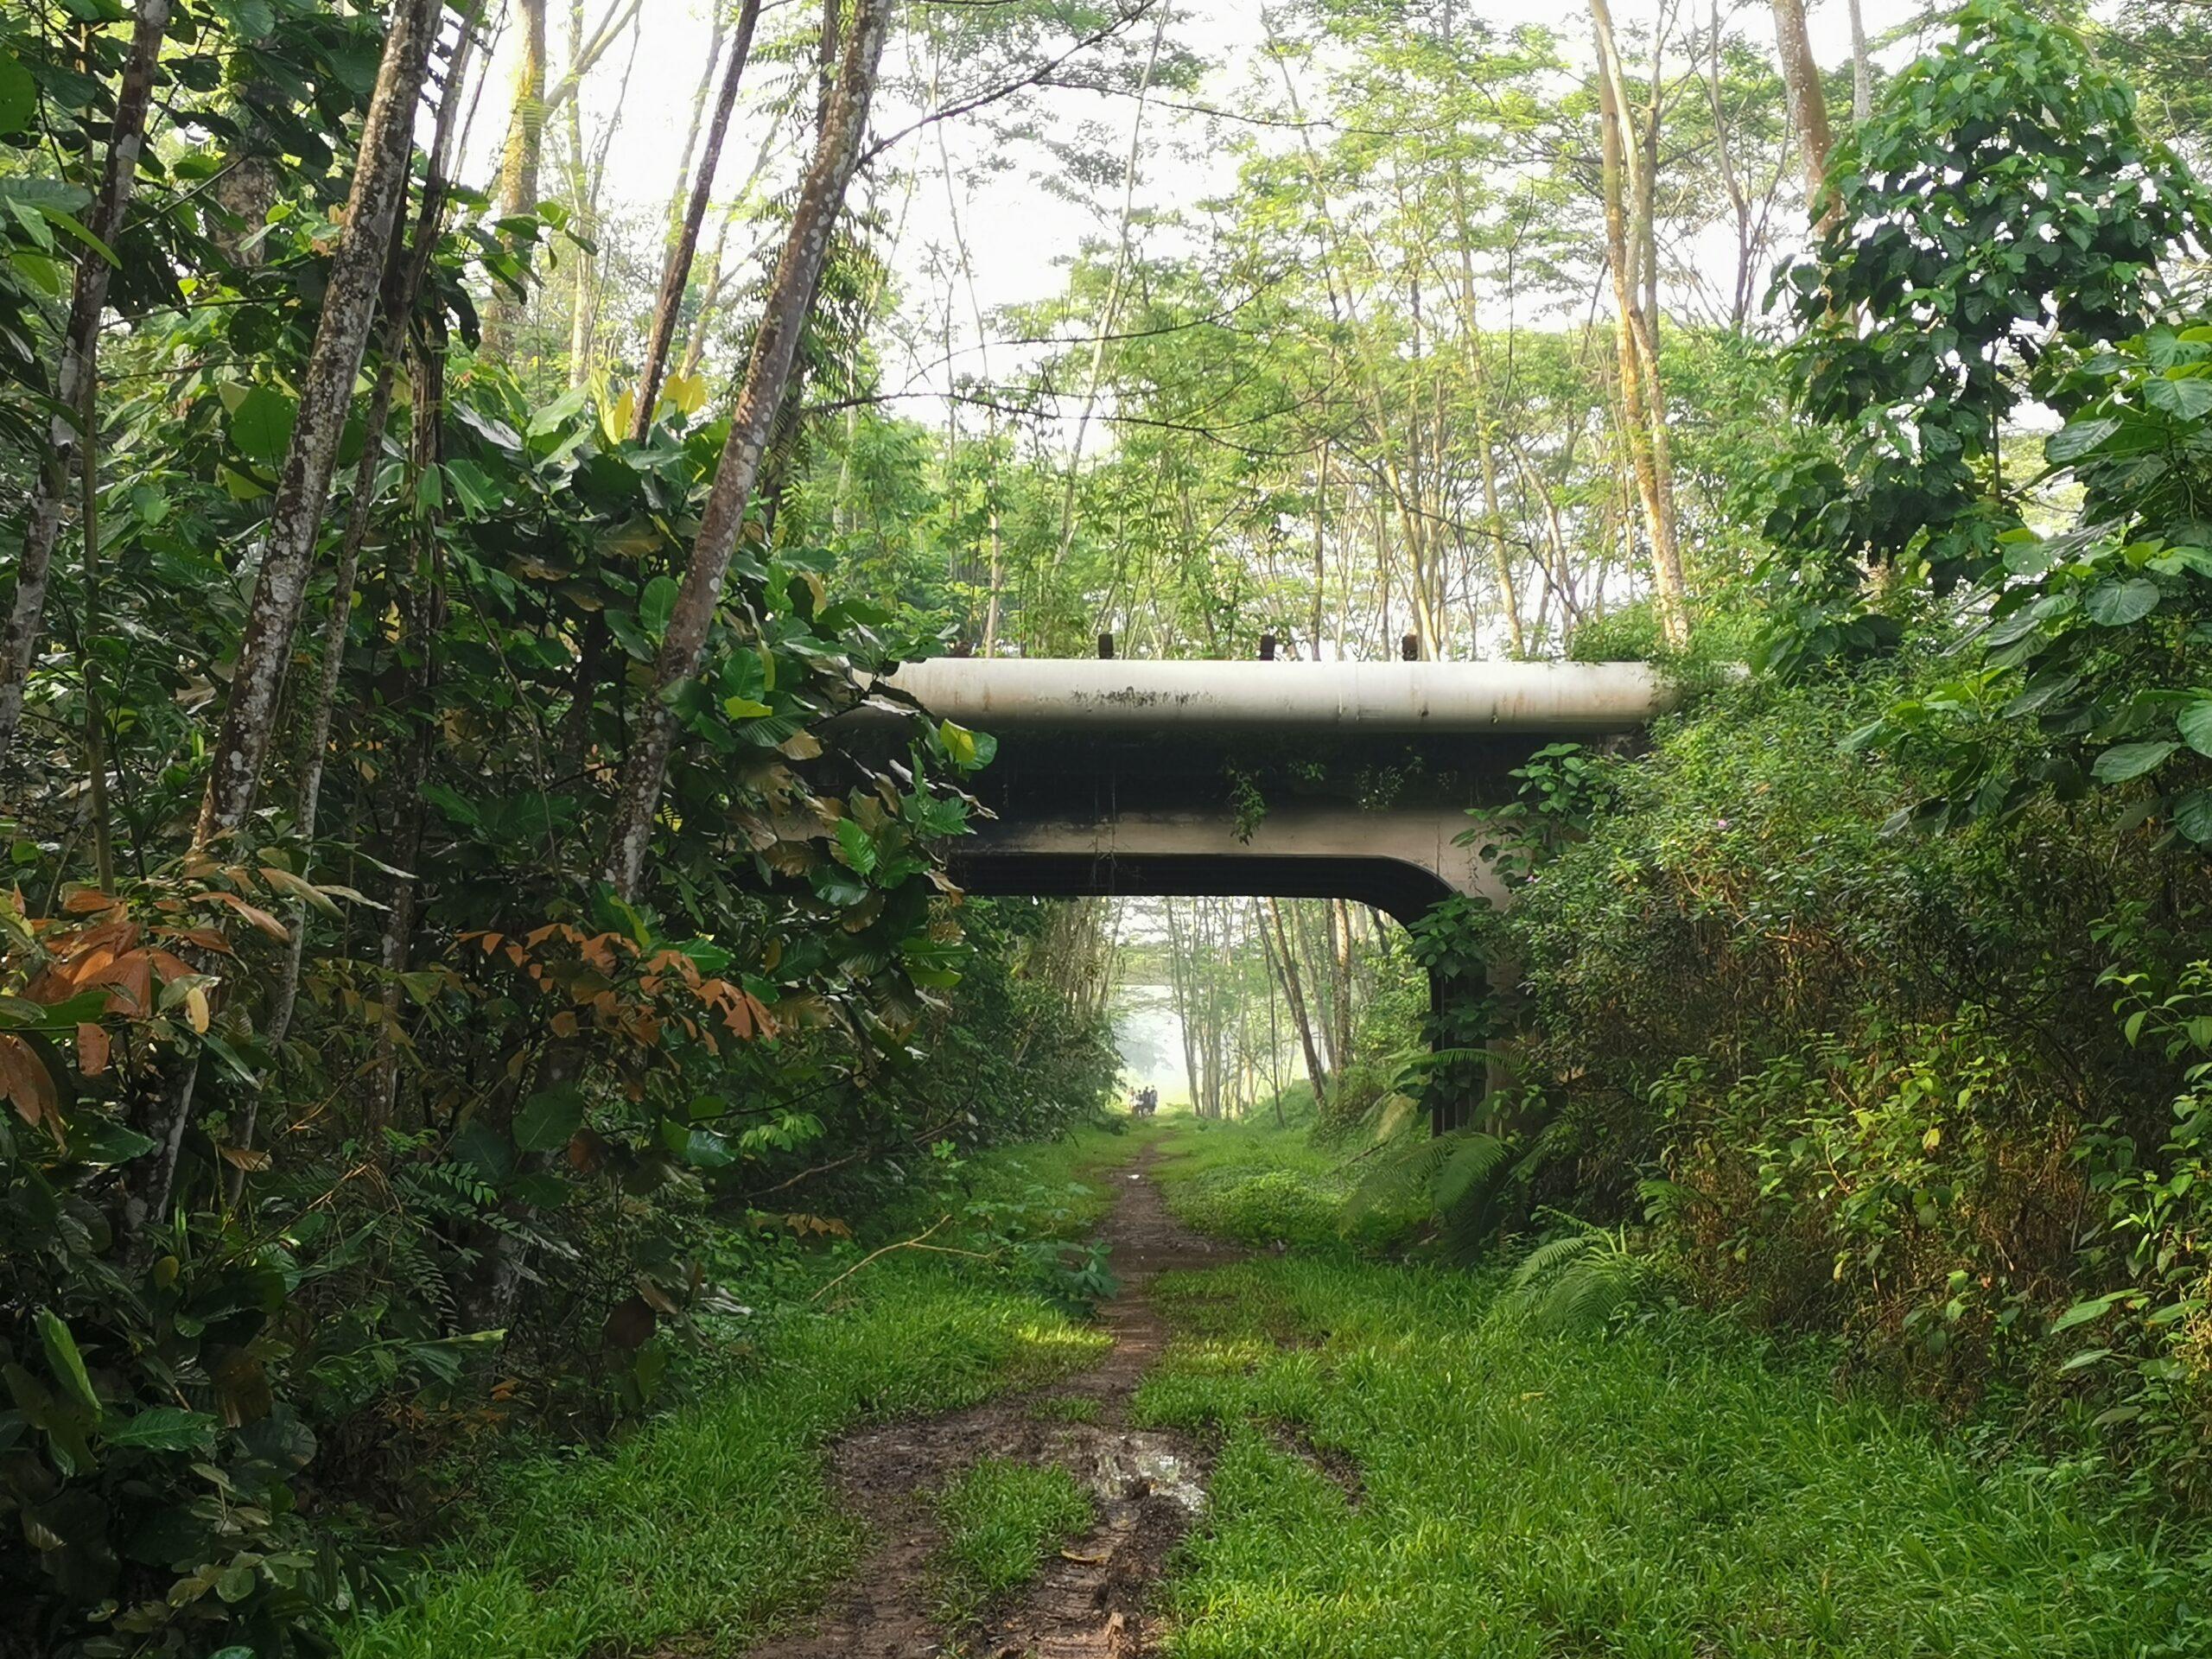 Singapore Rail Corridor (First Half)